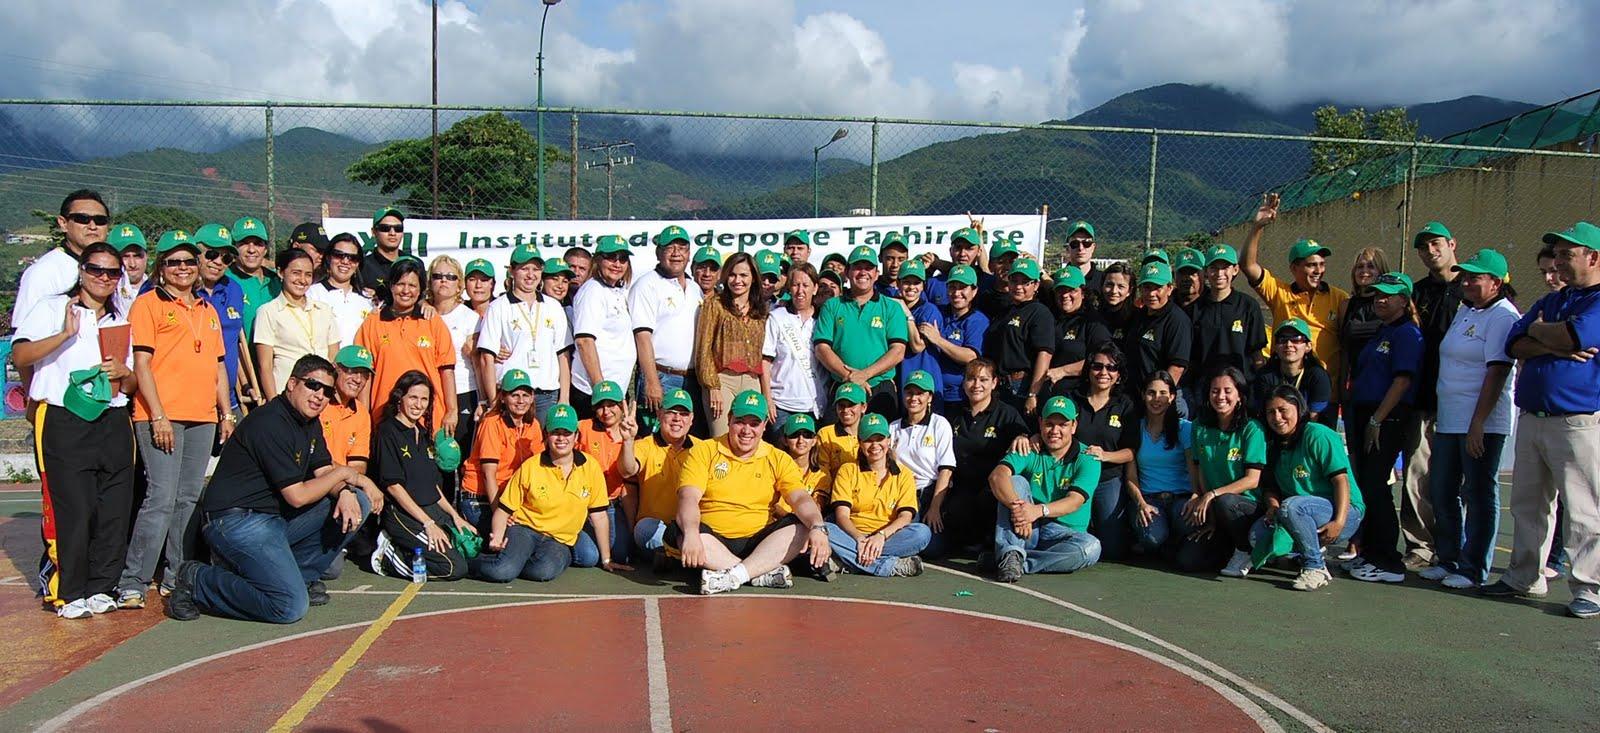 ezuela! Instituto del Deporte Tachirense iPoterncia Deportiva de Ven